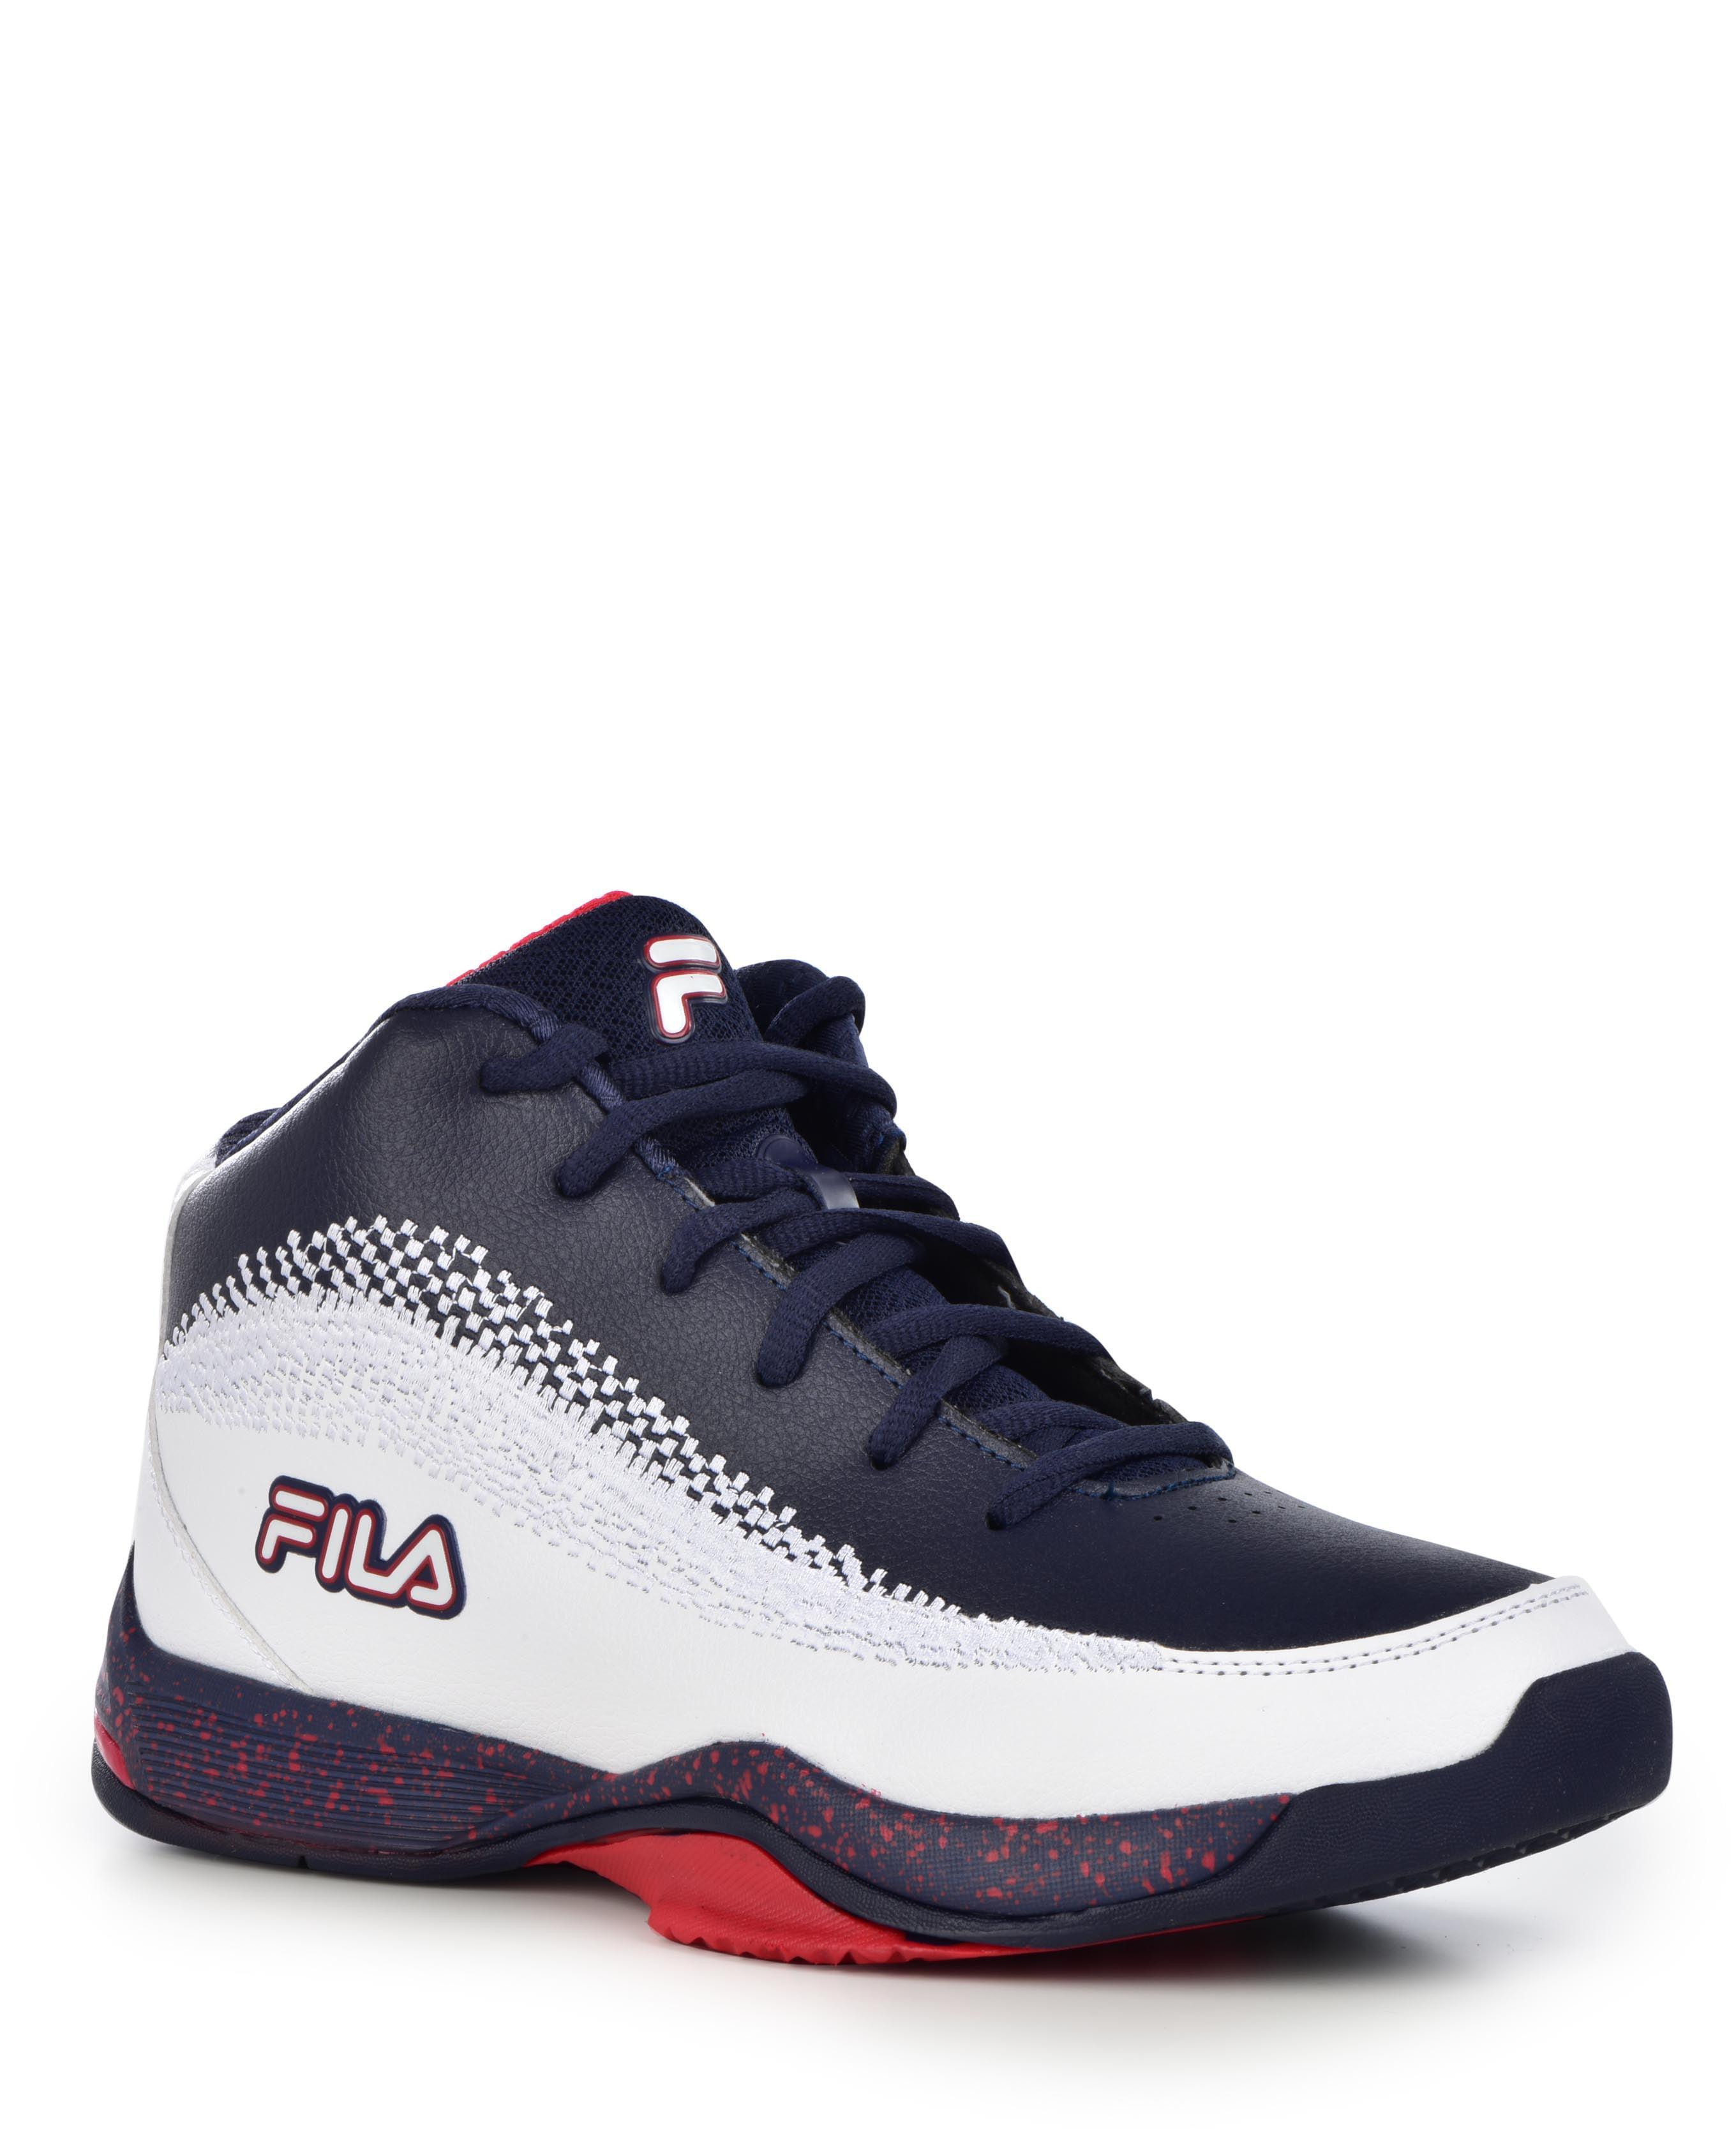 Fila Fila Men's Contingent 4 Basketball Sneaker